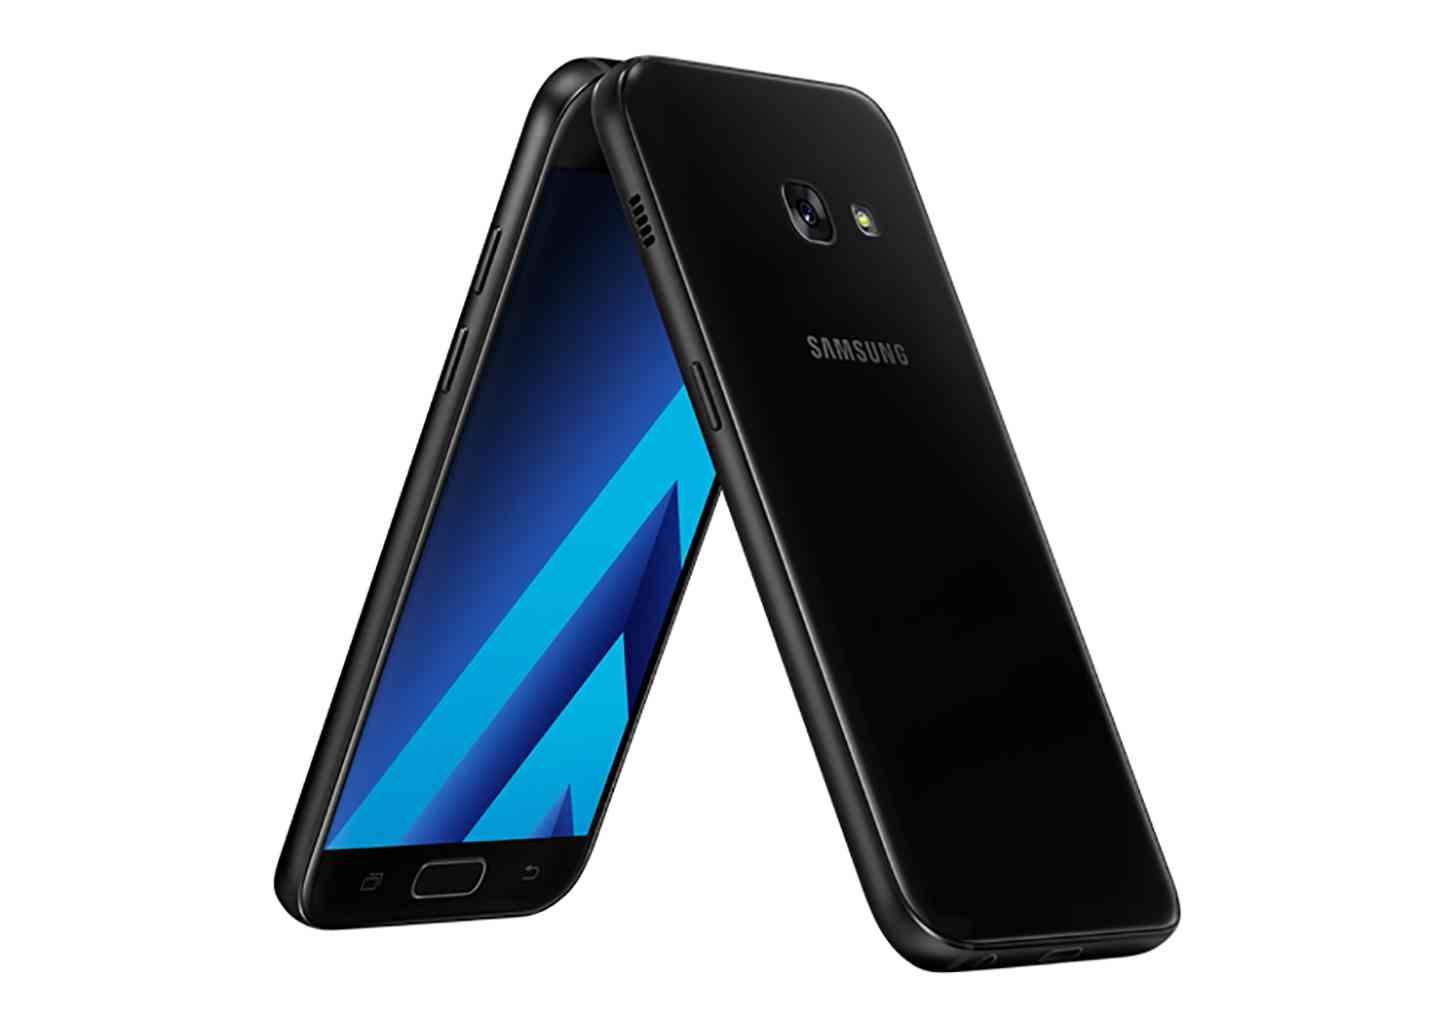 Samsung Galaxy A (2017) official